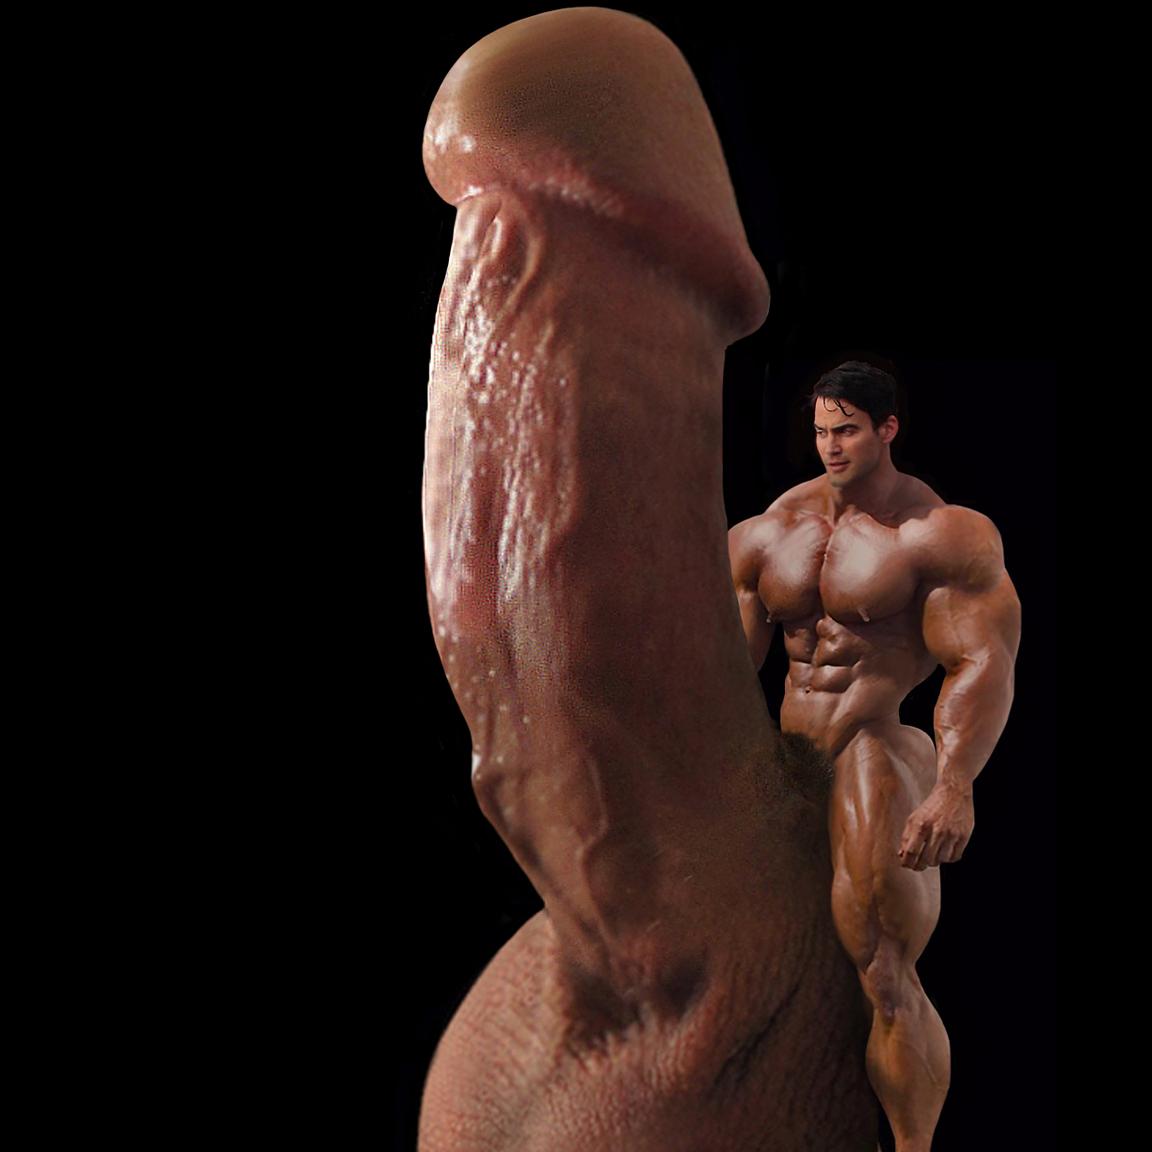 cock-growth-porn-lisa-london-naked